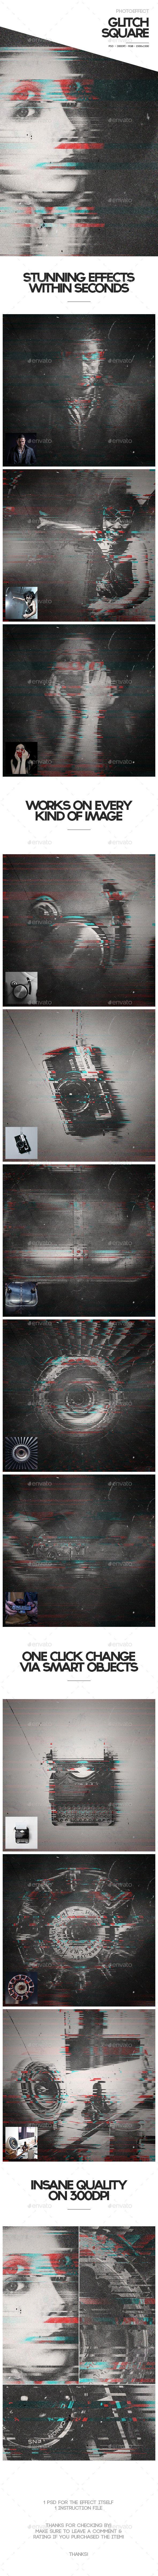 Glitch Square Photoeffect #design Download: http://graphicriver.net/item/glitch-square-photoeffect/11040111?ref=ksioks